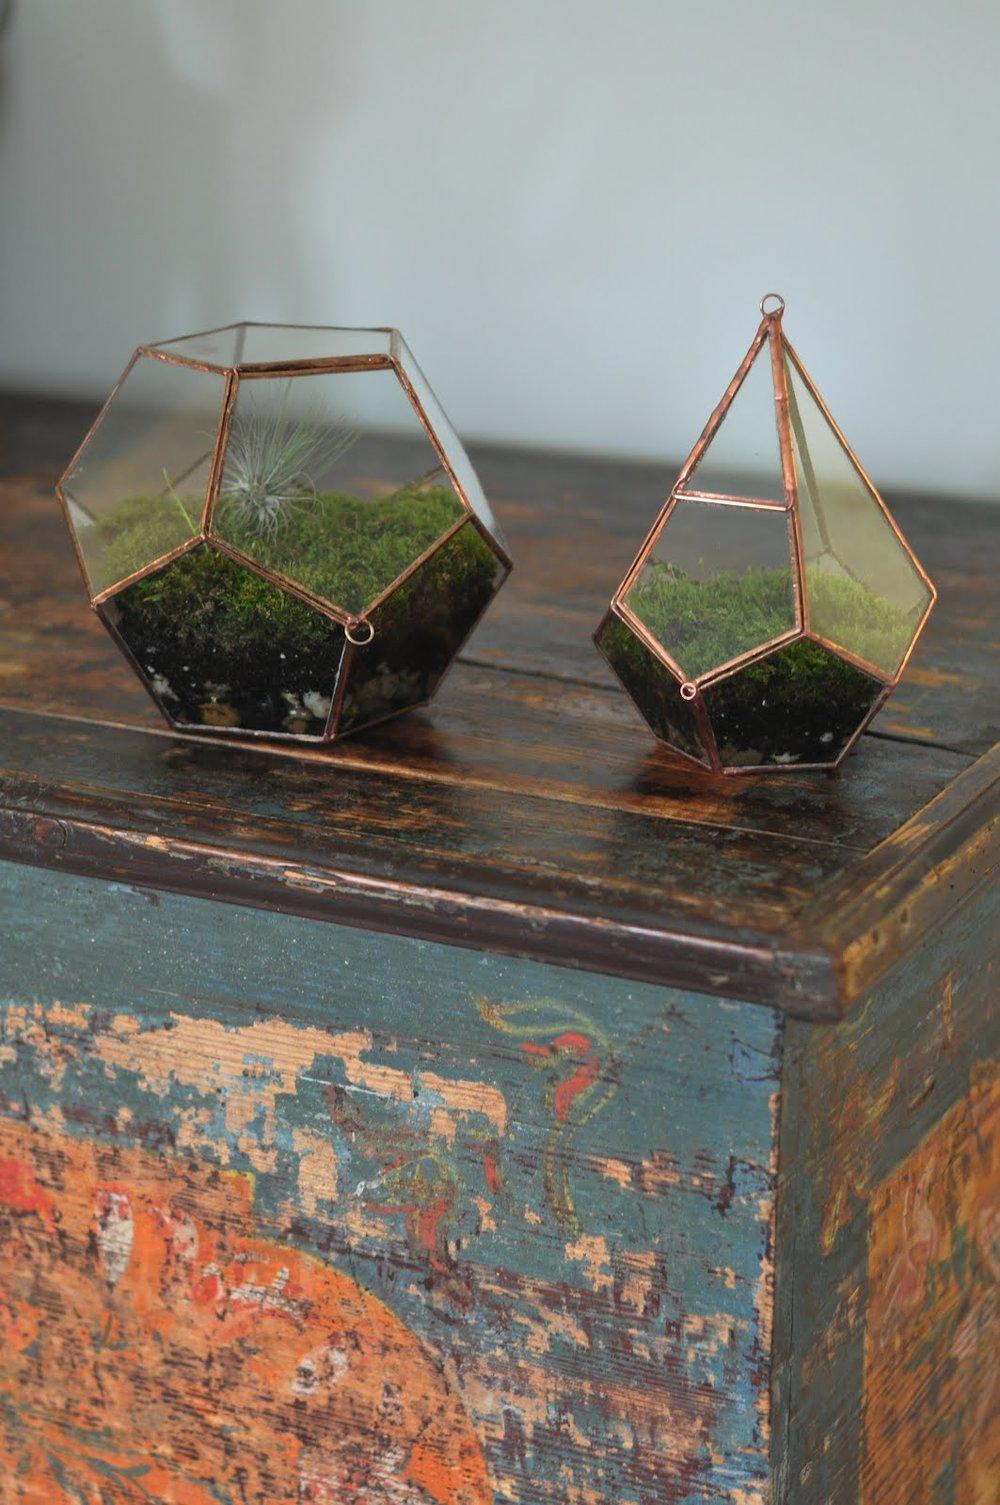 mapart.me:   ABJ glassworks - moss terrariums